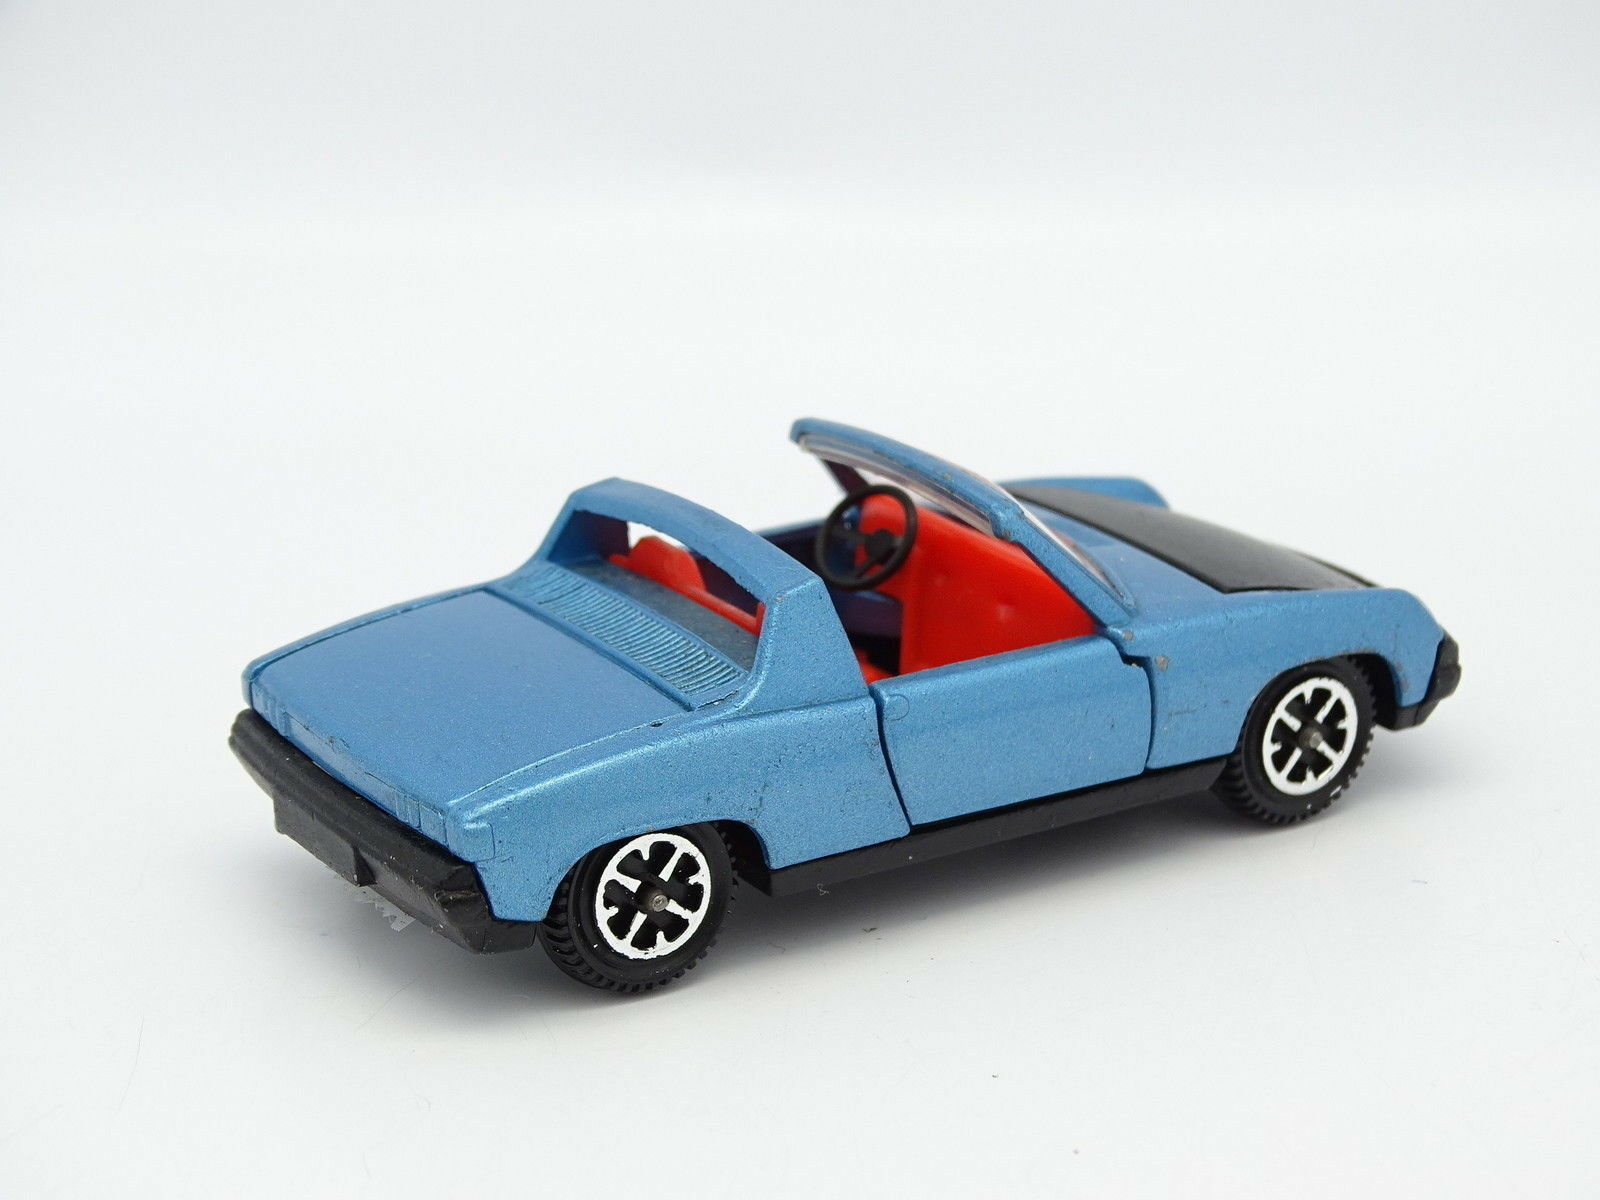 Dinky Spielzeug GB SB 1 1 1 43 - porsche 914 blue 21161e